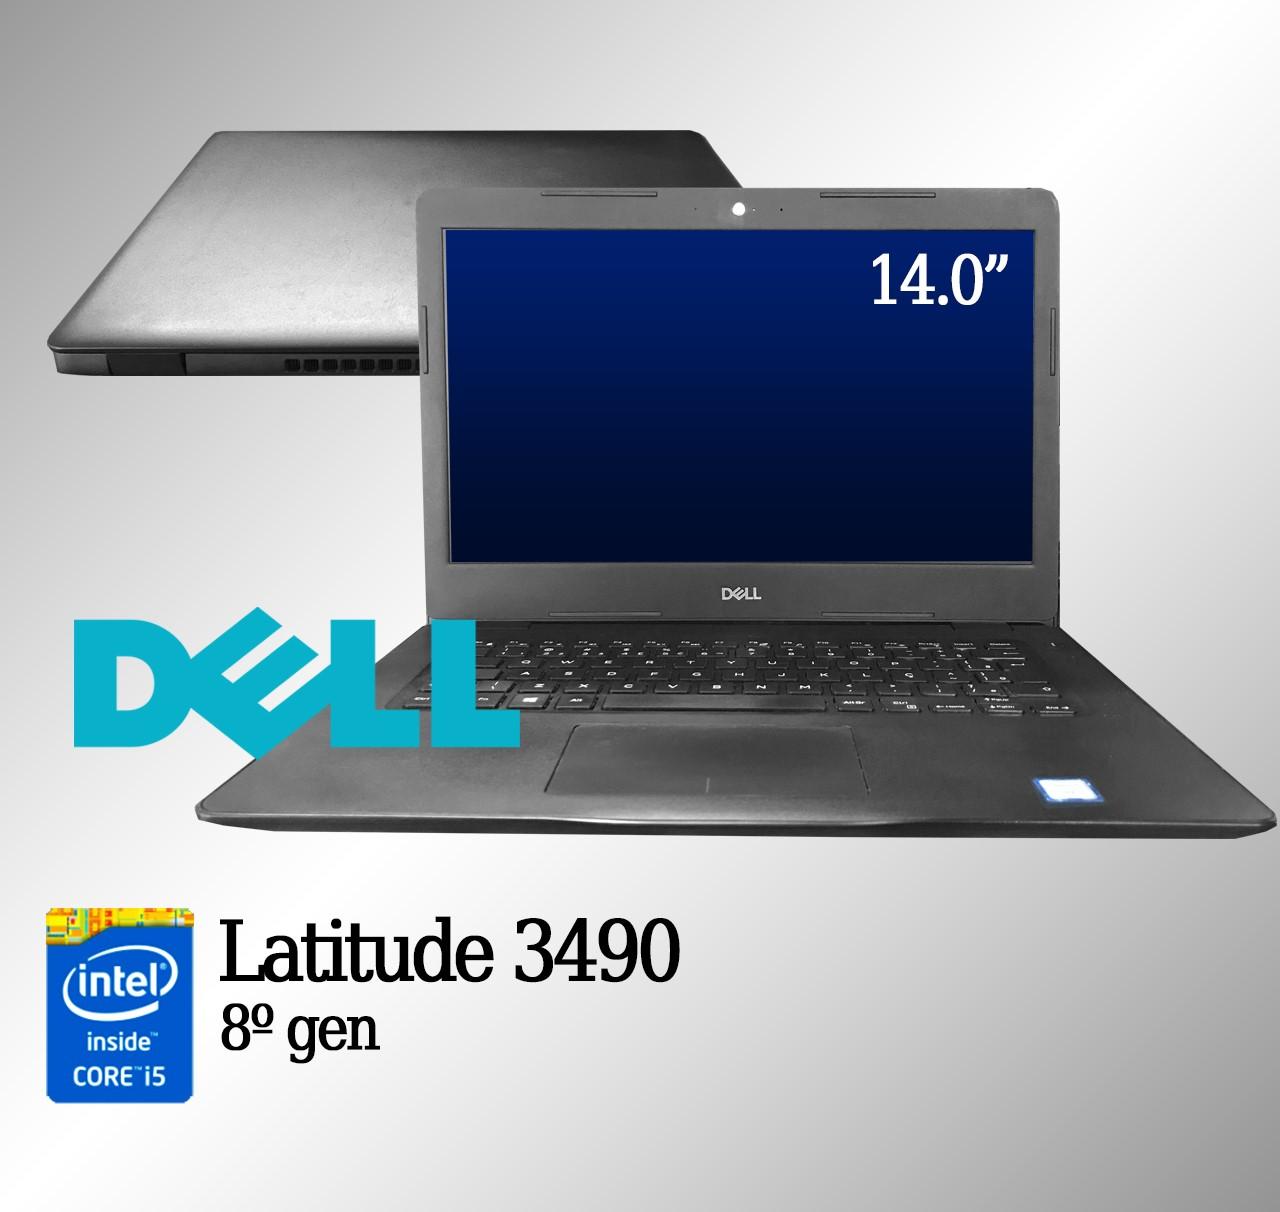 Laptop Dell Latitude 3490 Intel i5 8a. 8GB de memória RAM e 500GB de disco